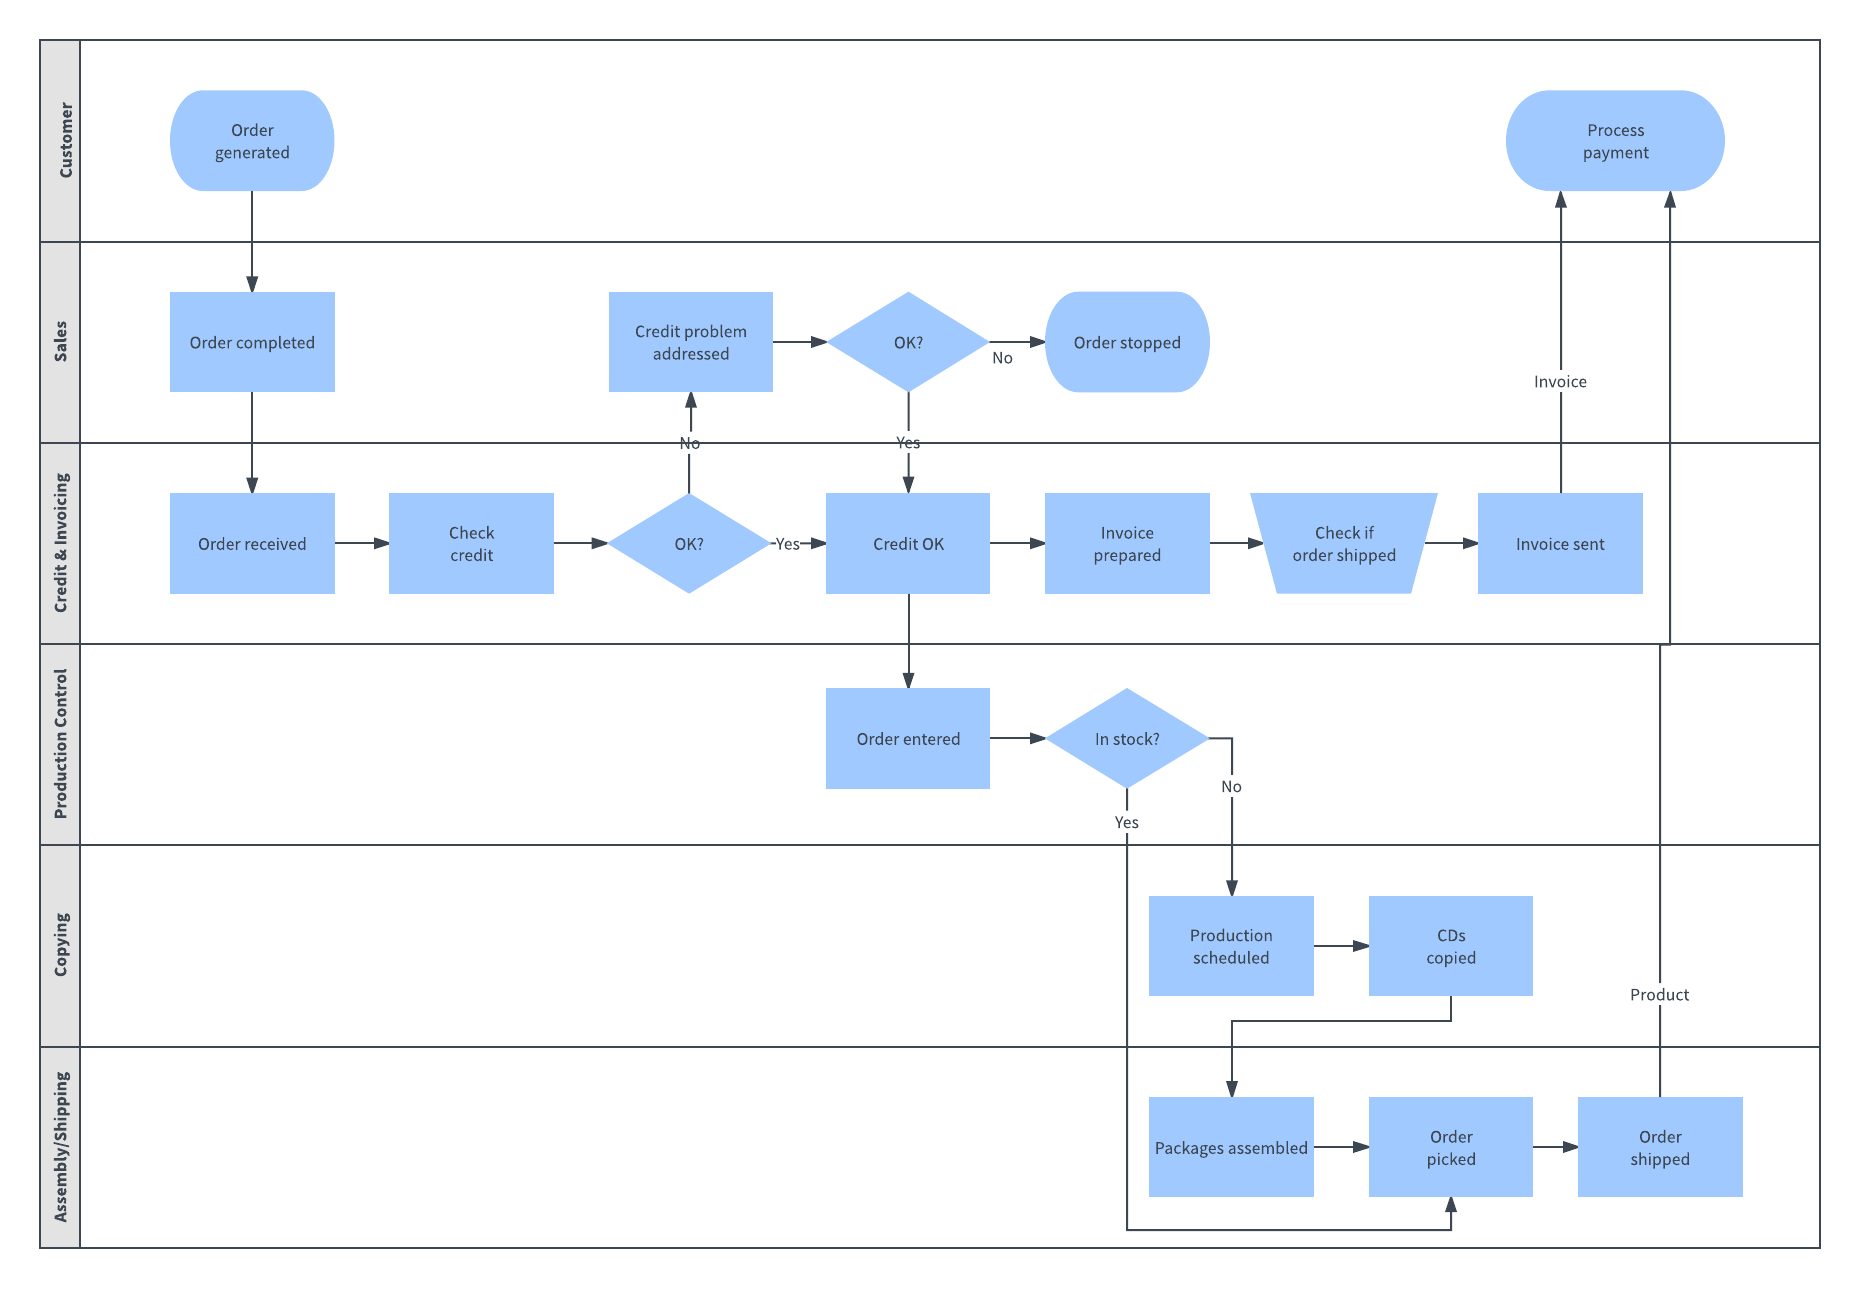 swim lane diagram in ppt 1988 ezgo marathon wiring swimlane process mapping template